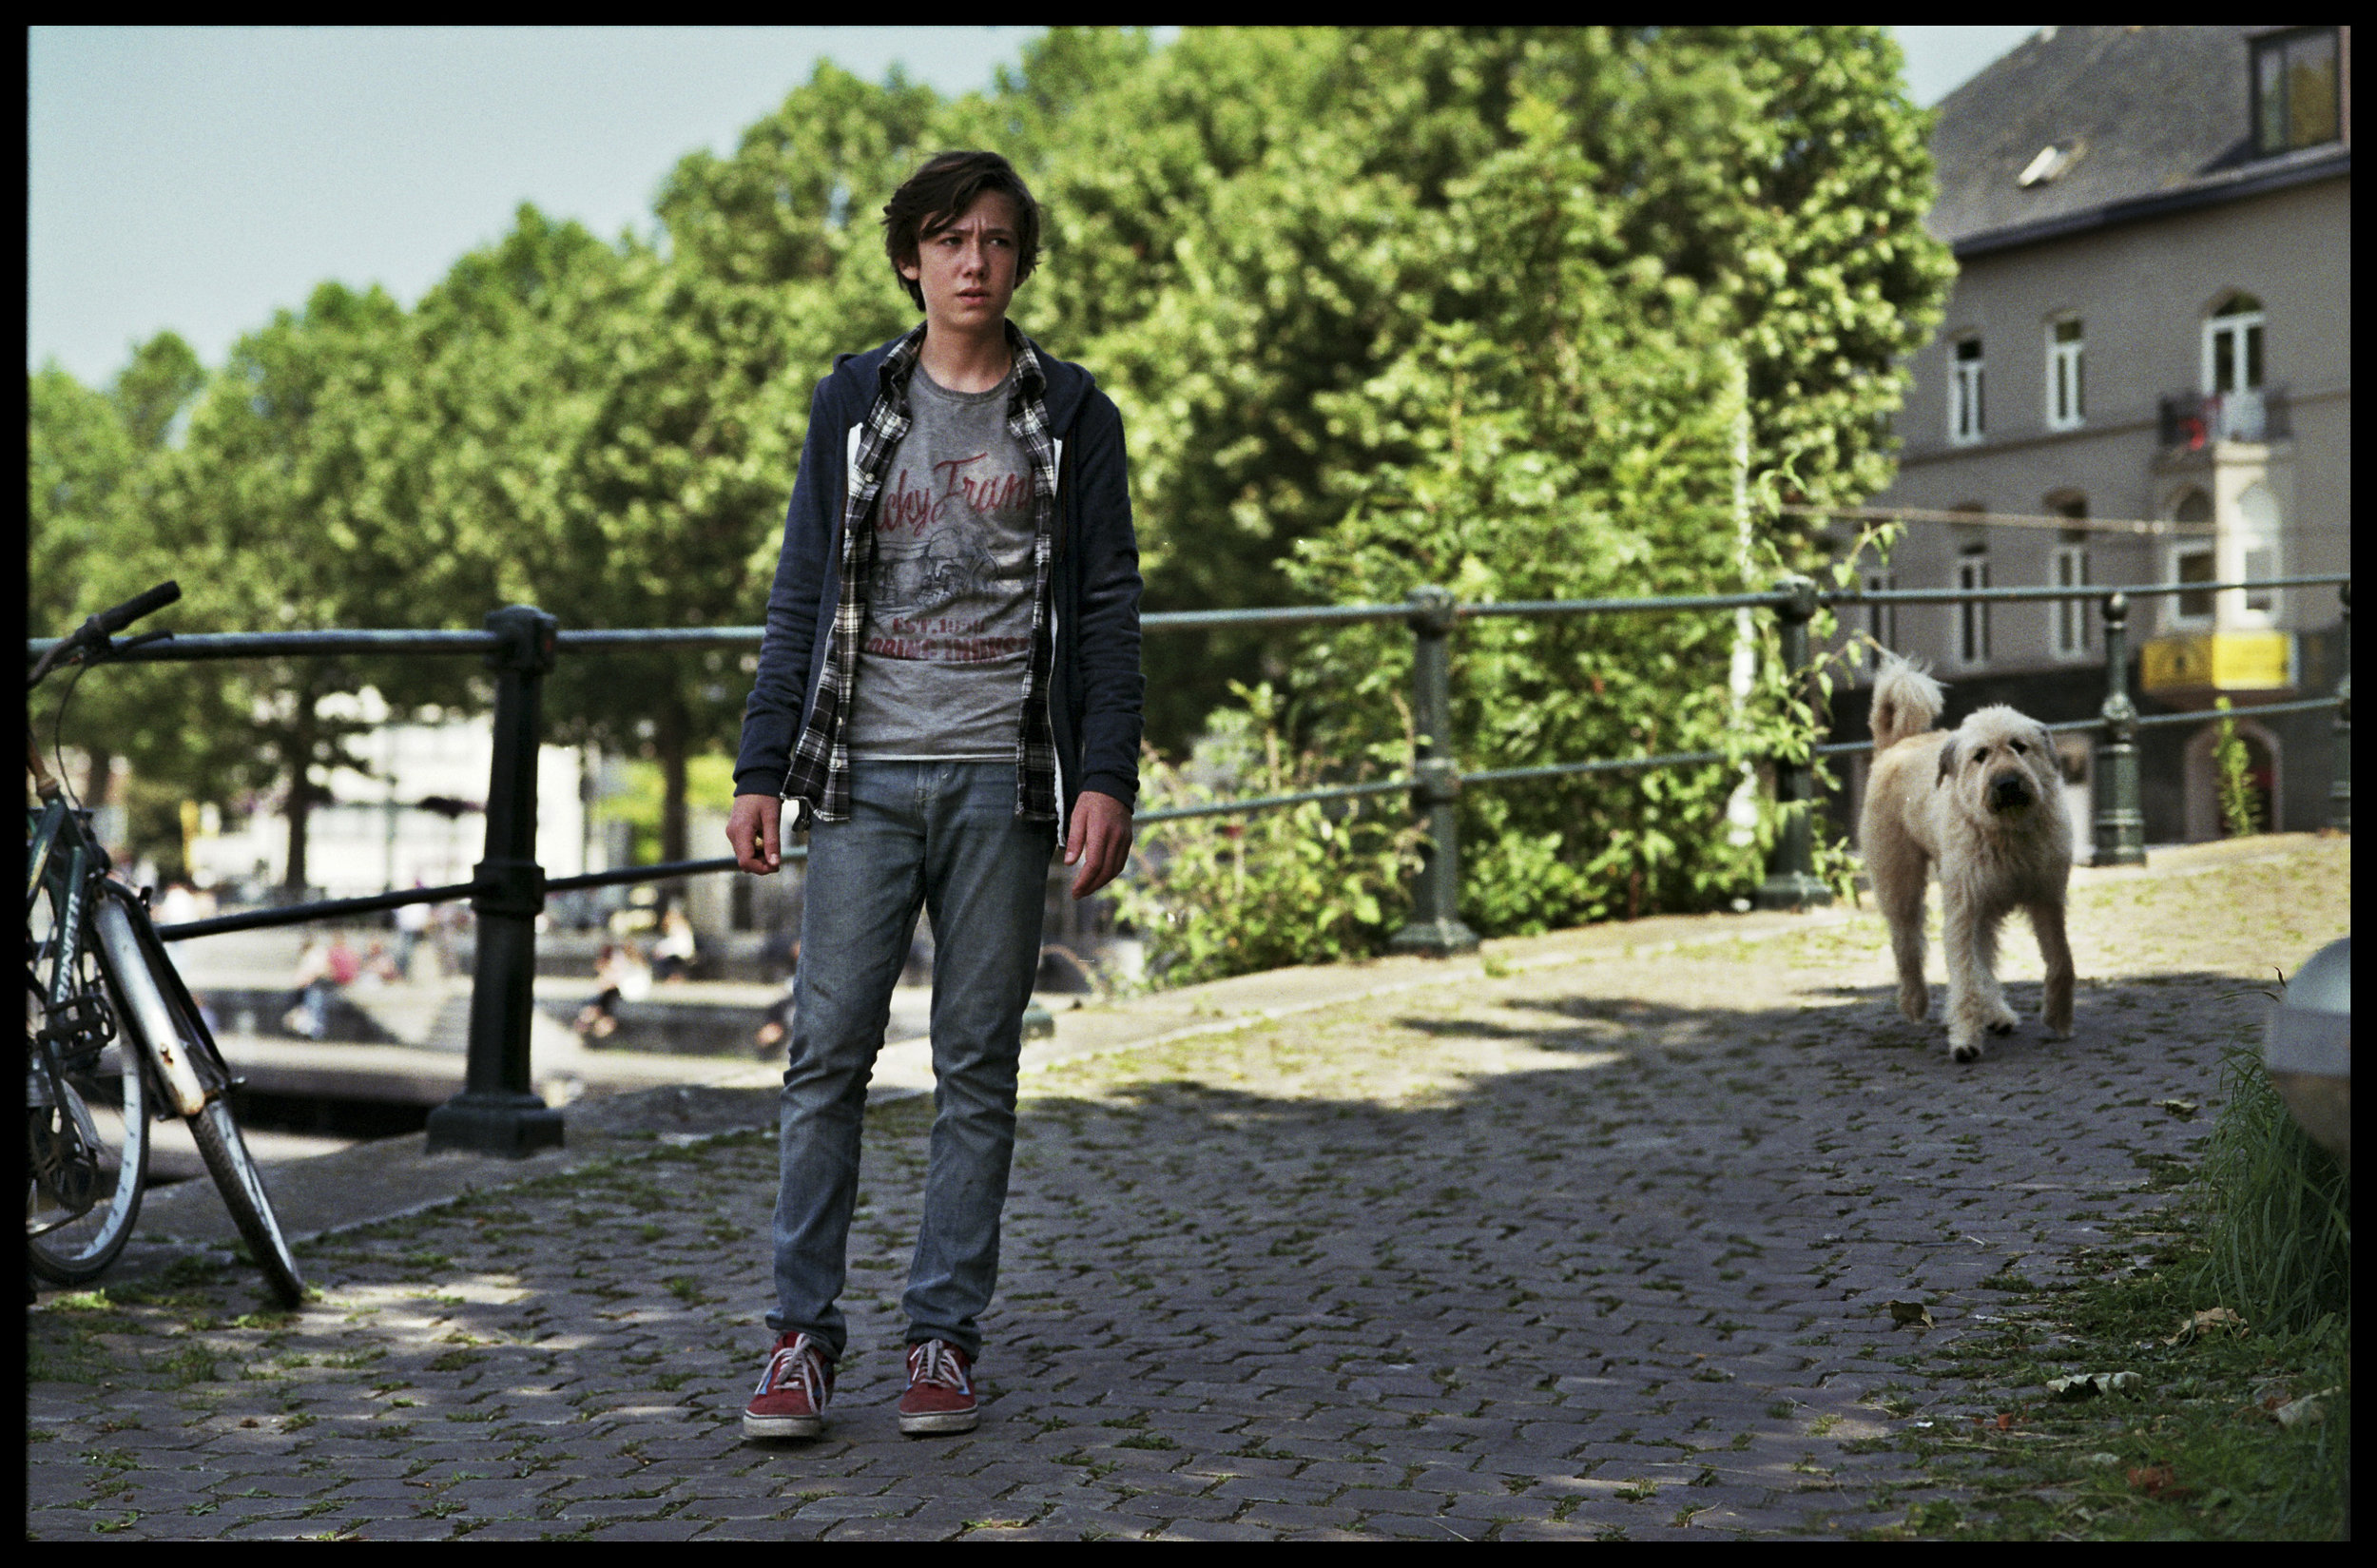 still 15 - copyright Savage Film:Kris De Witte.jpg